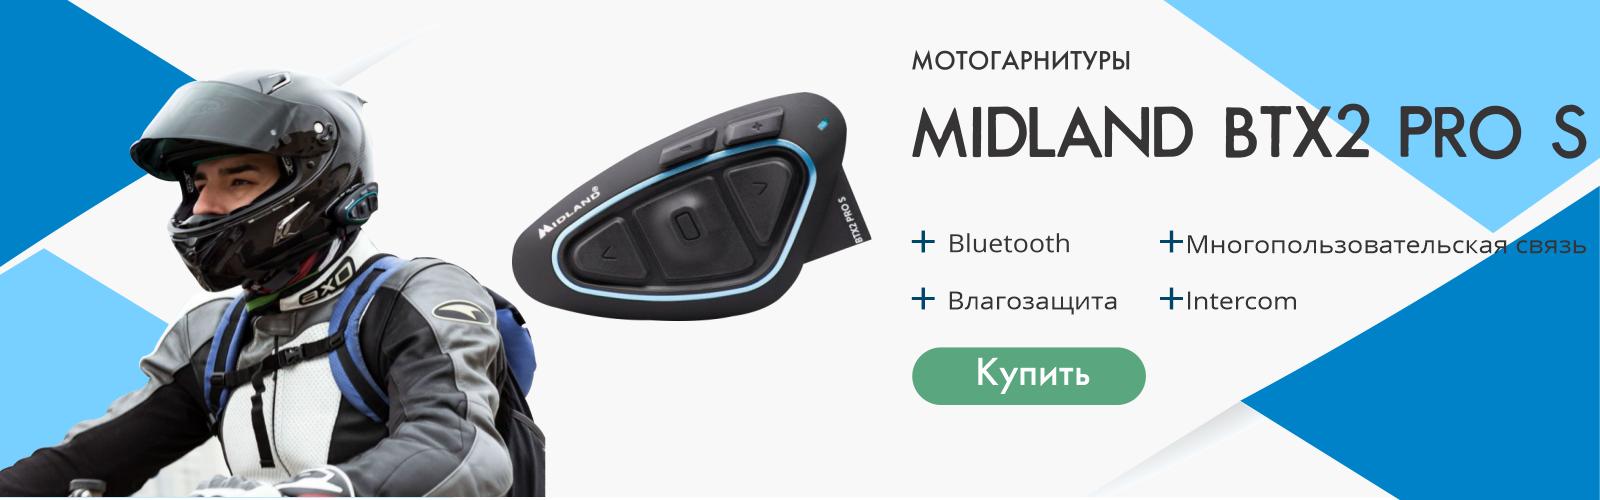 Midland BTX2 PRO S